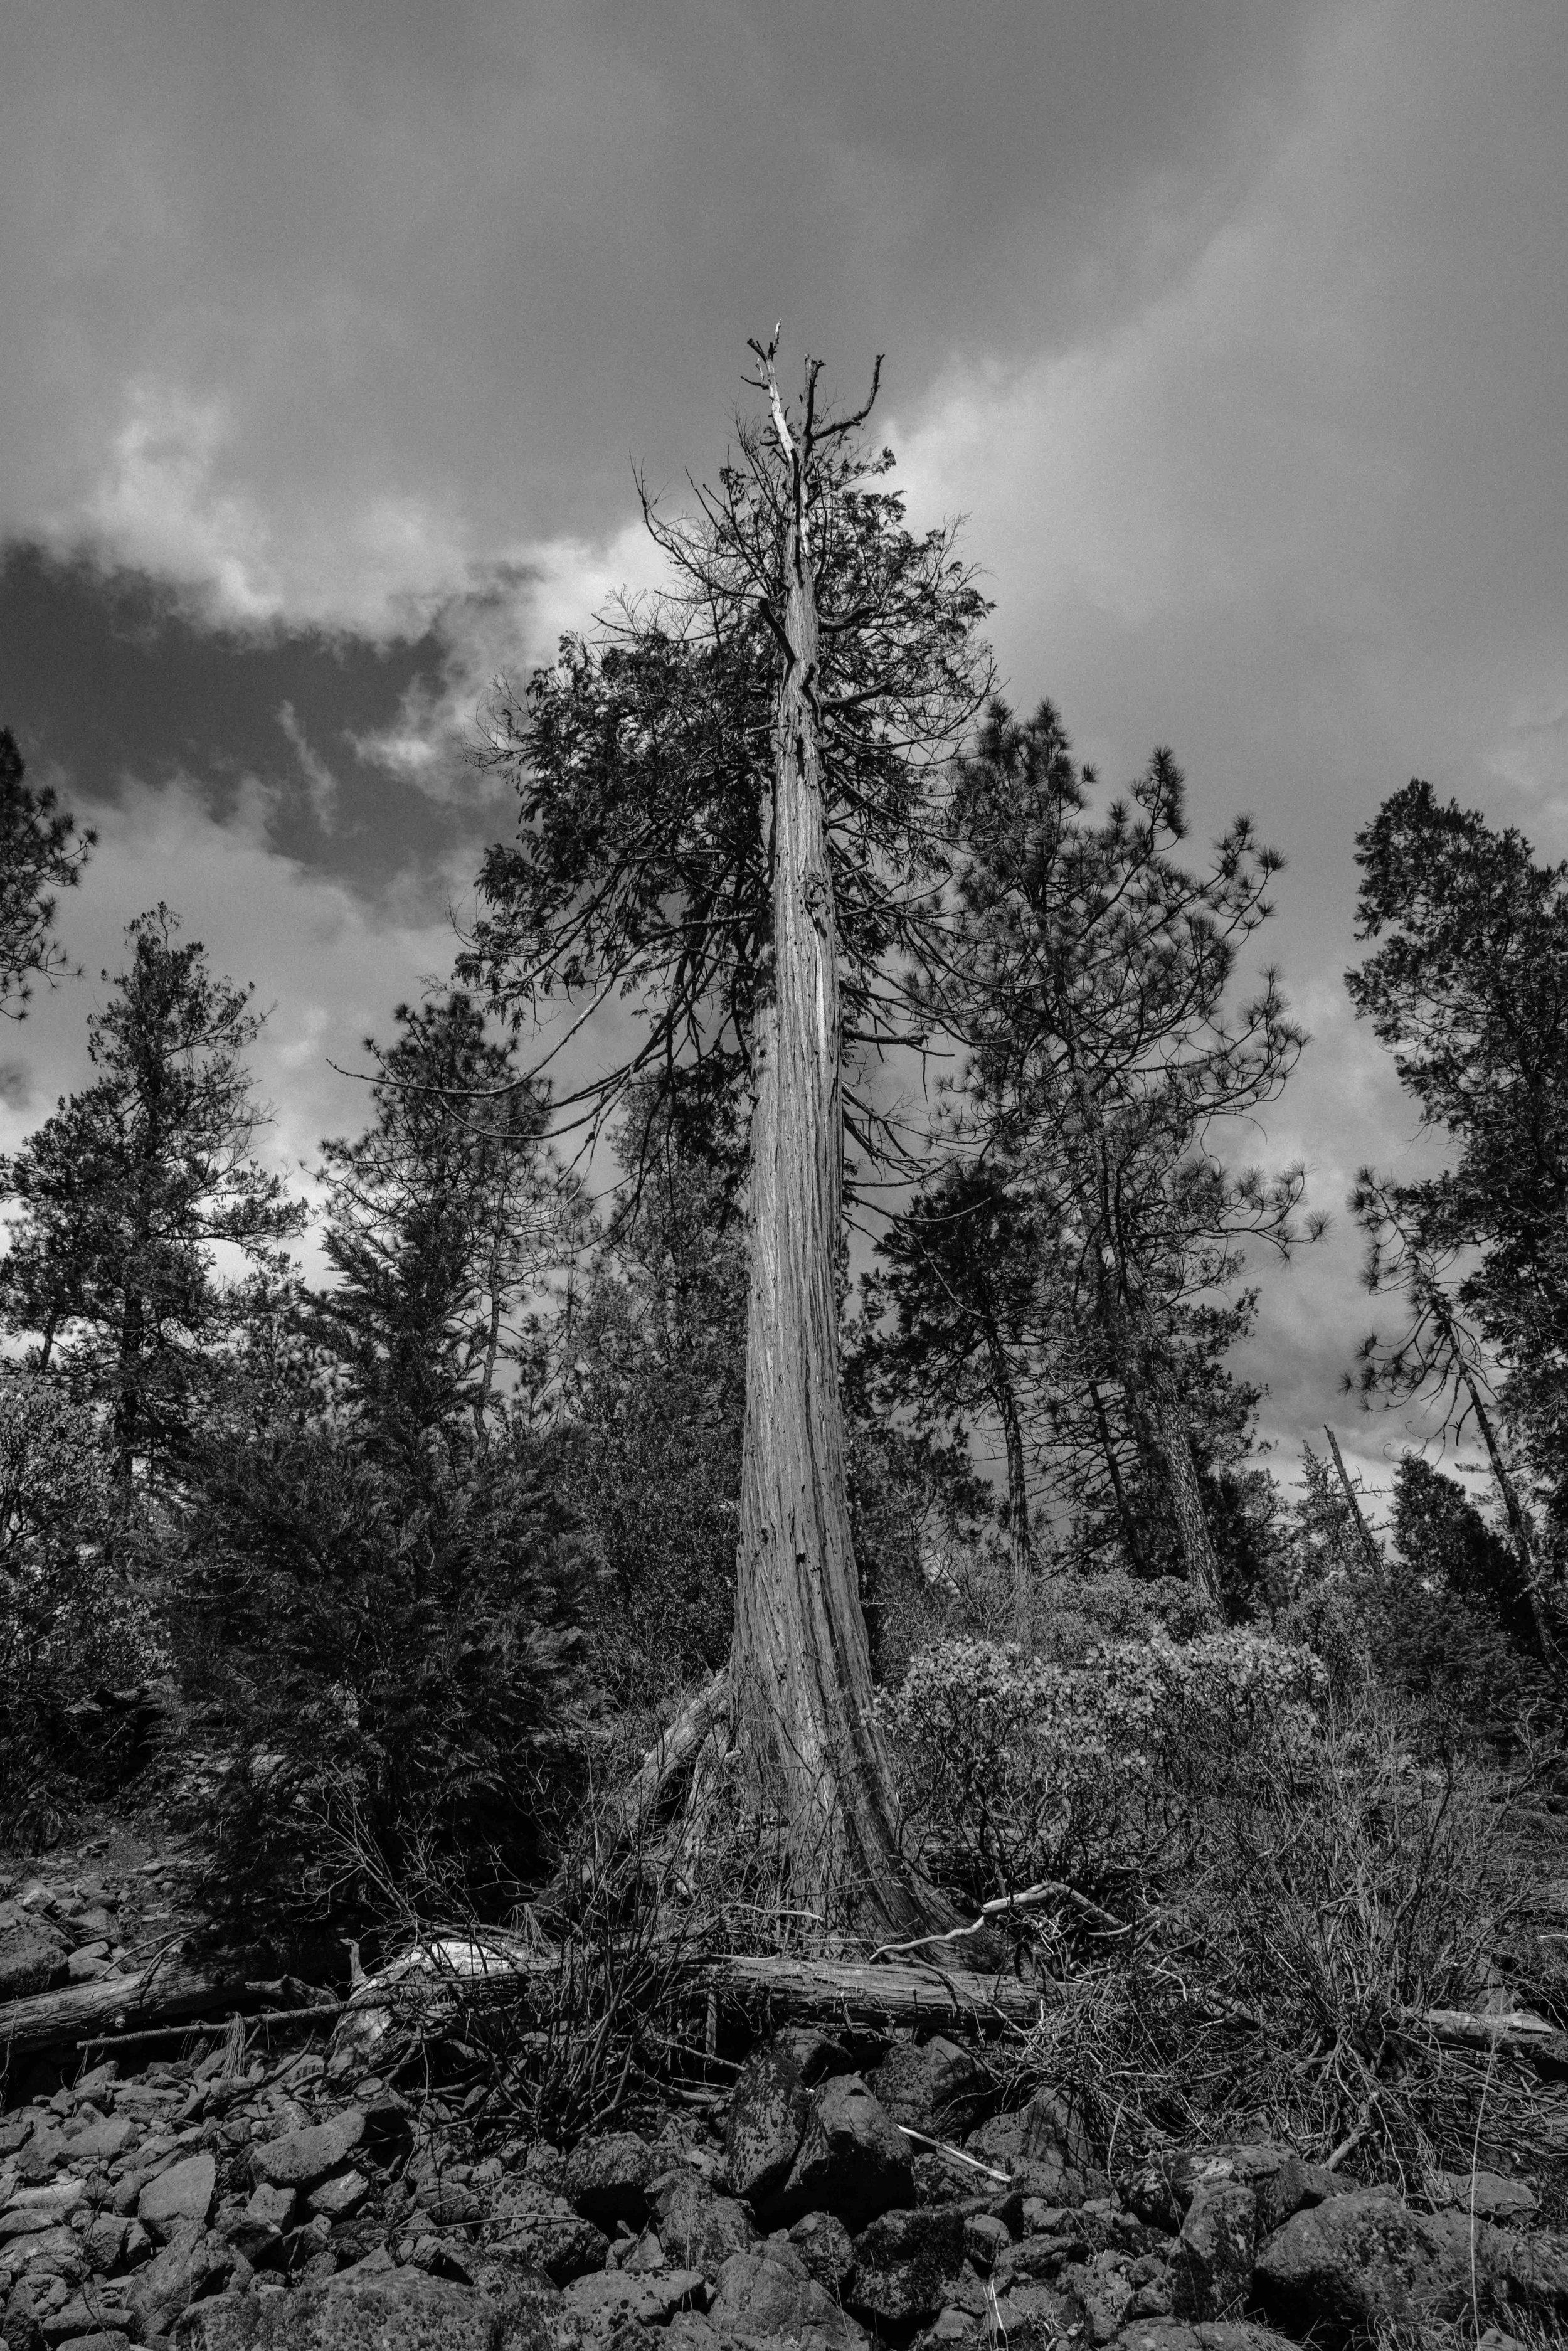 josue-rivas-culture-crush-nature-treet.jpg